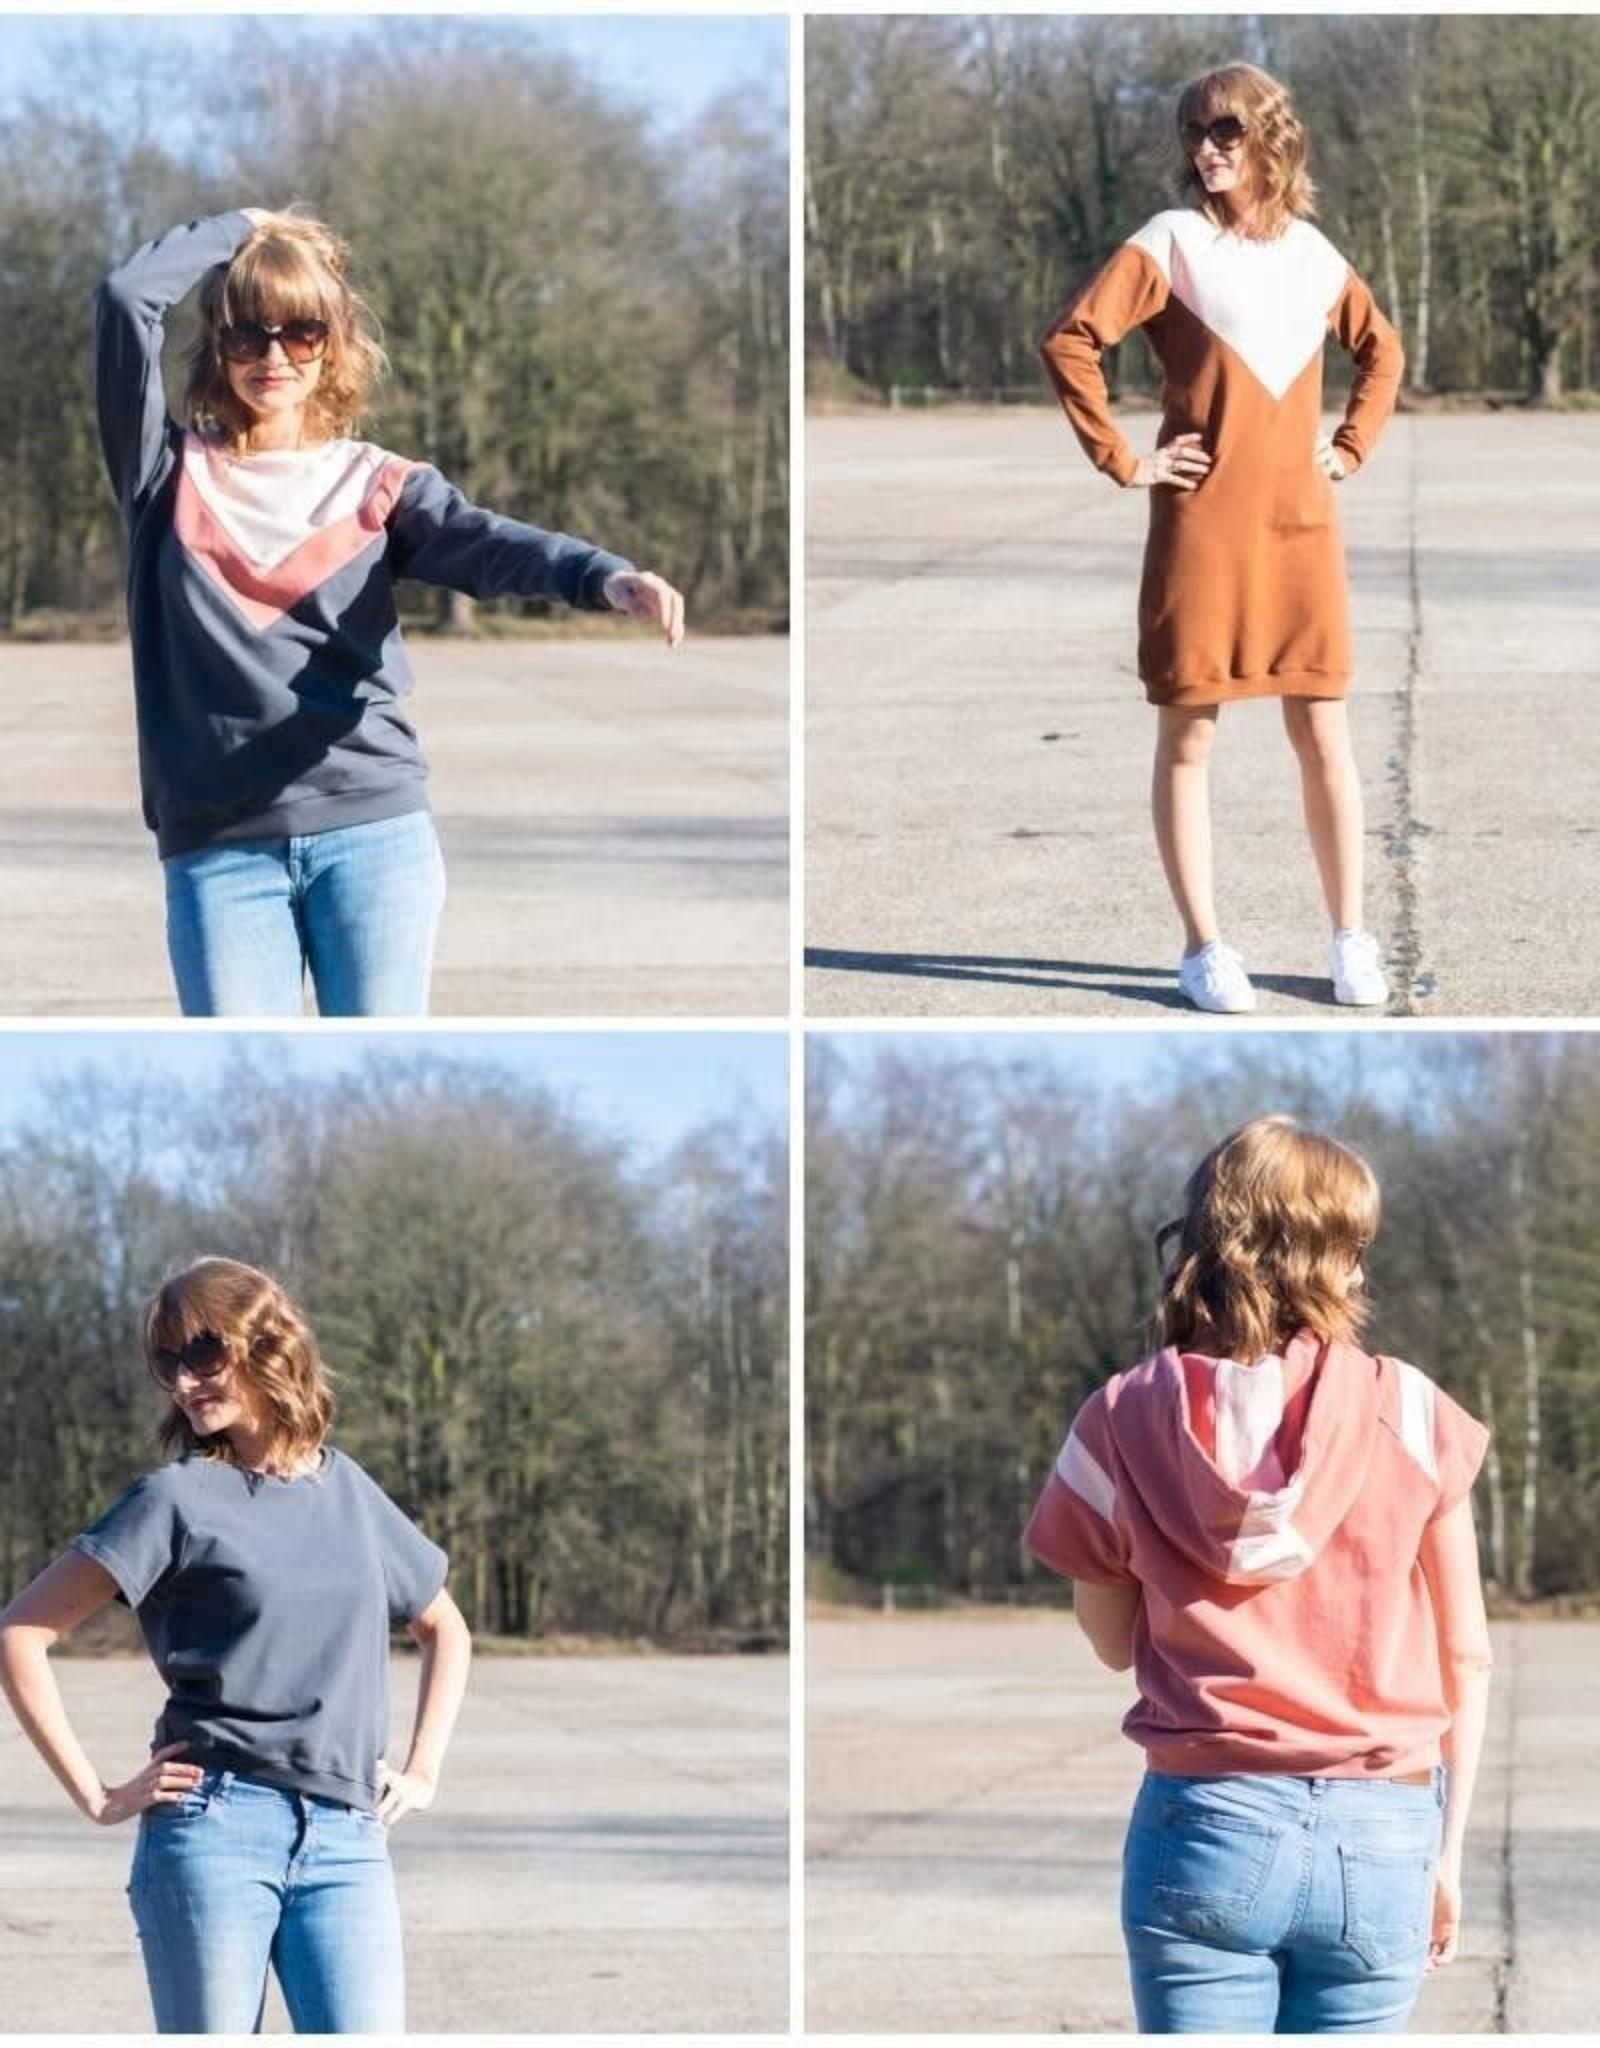 Bel' Etoile Isa sweater, sweaterjurk en top voor dames en tieners naaipatroon